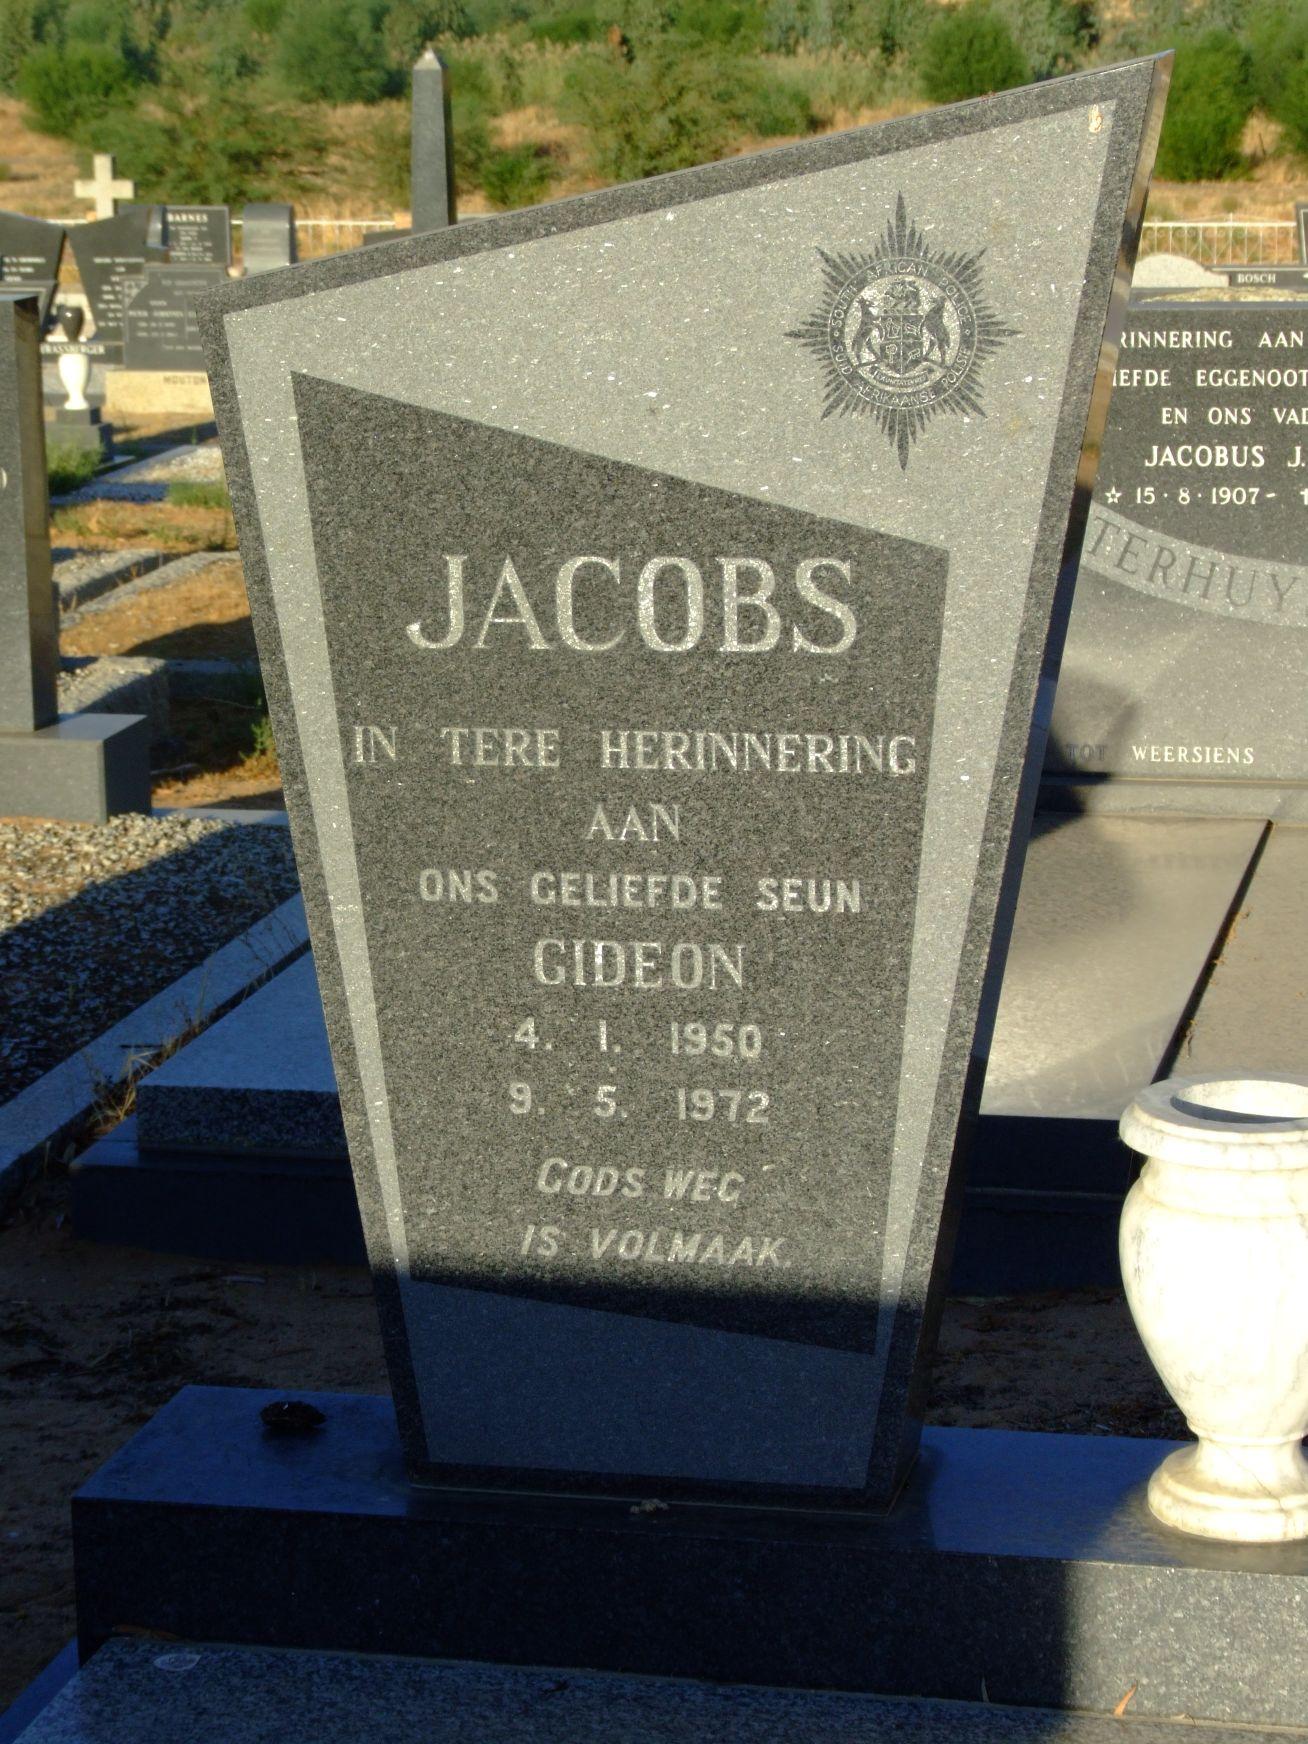 Jacobs Gideon (2)